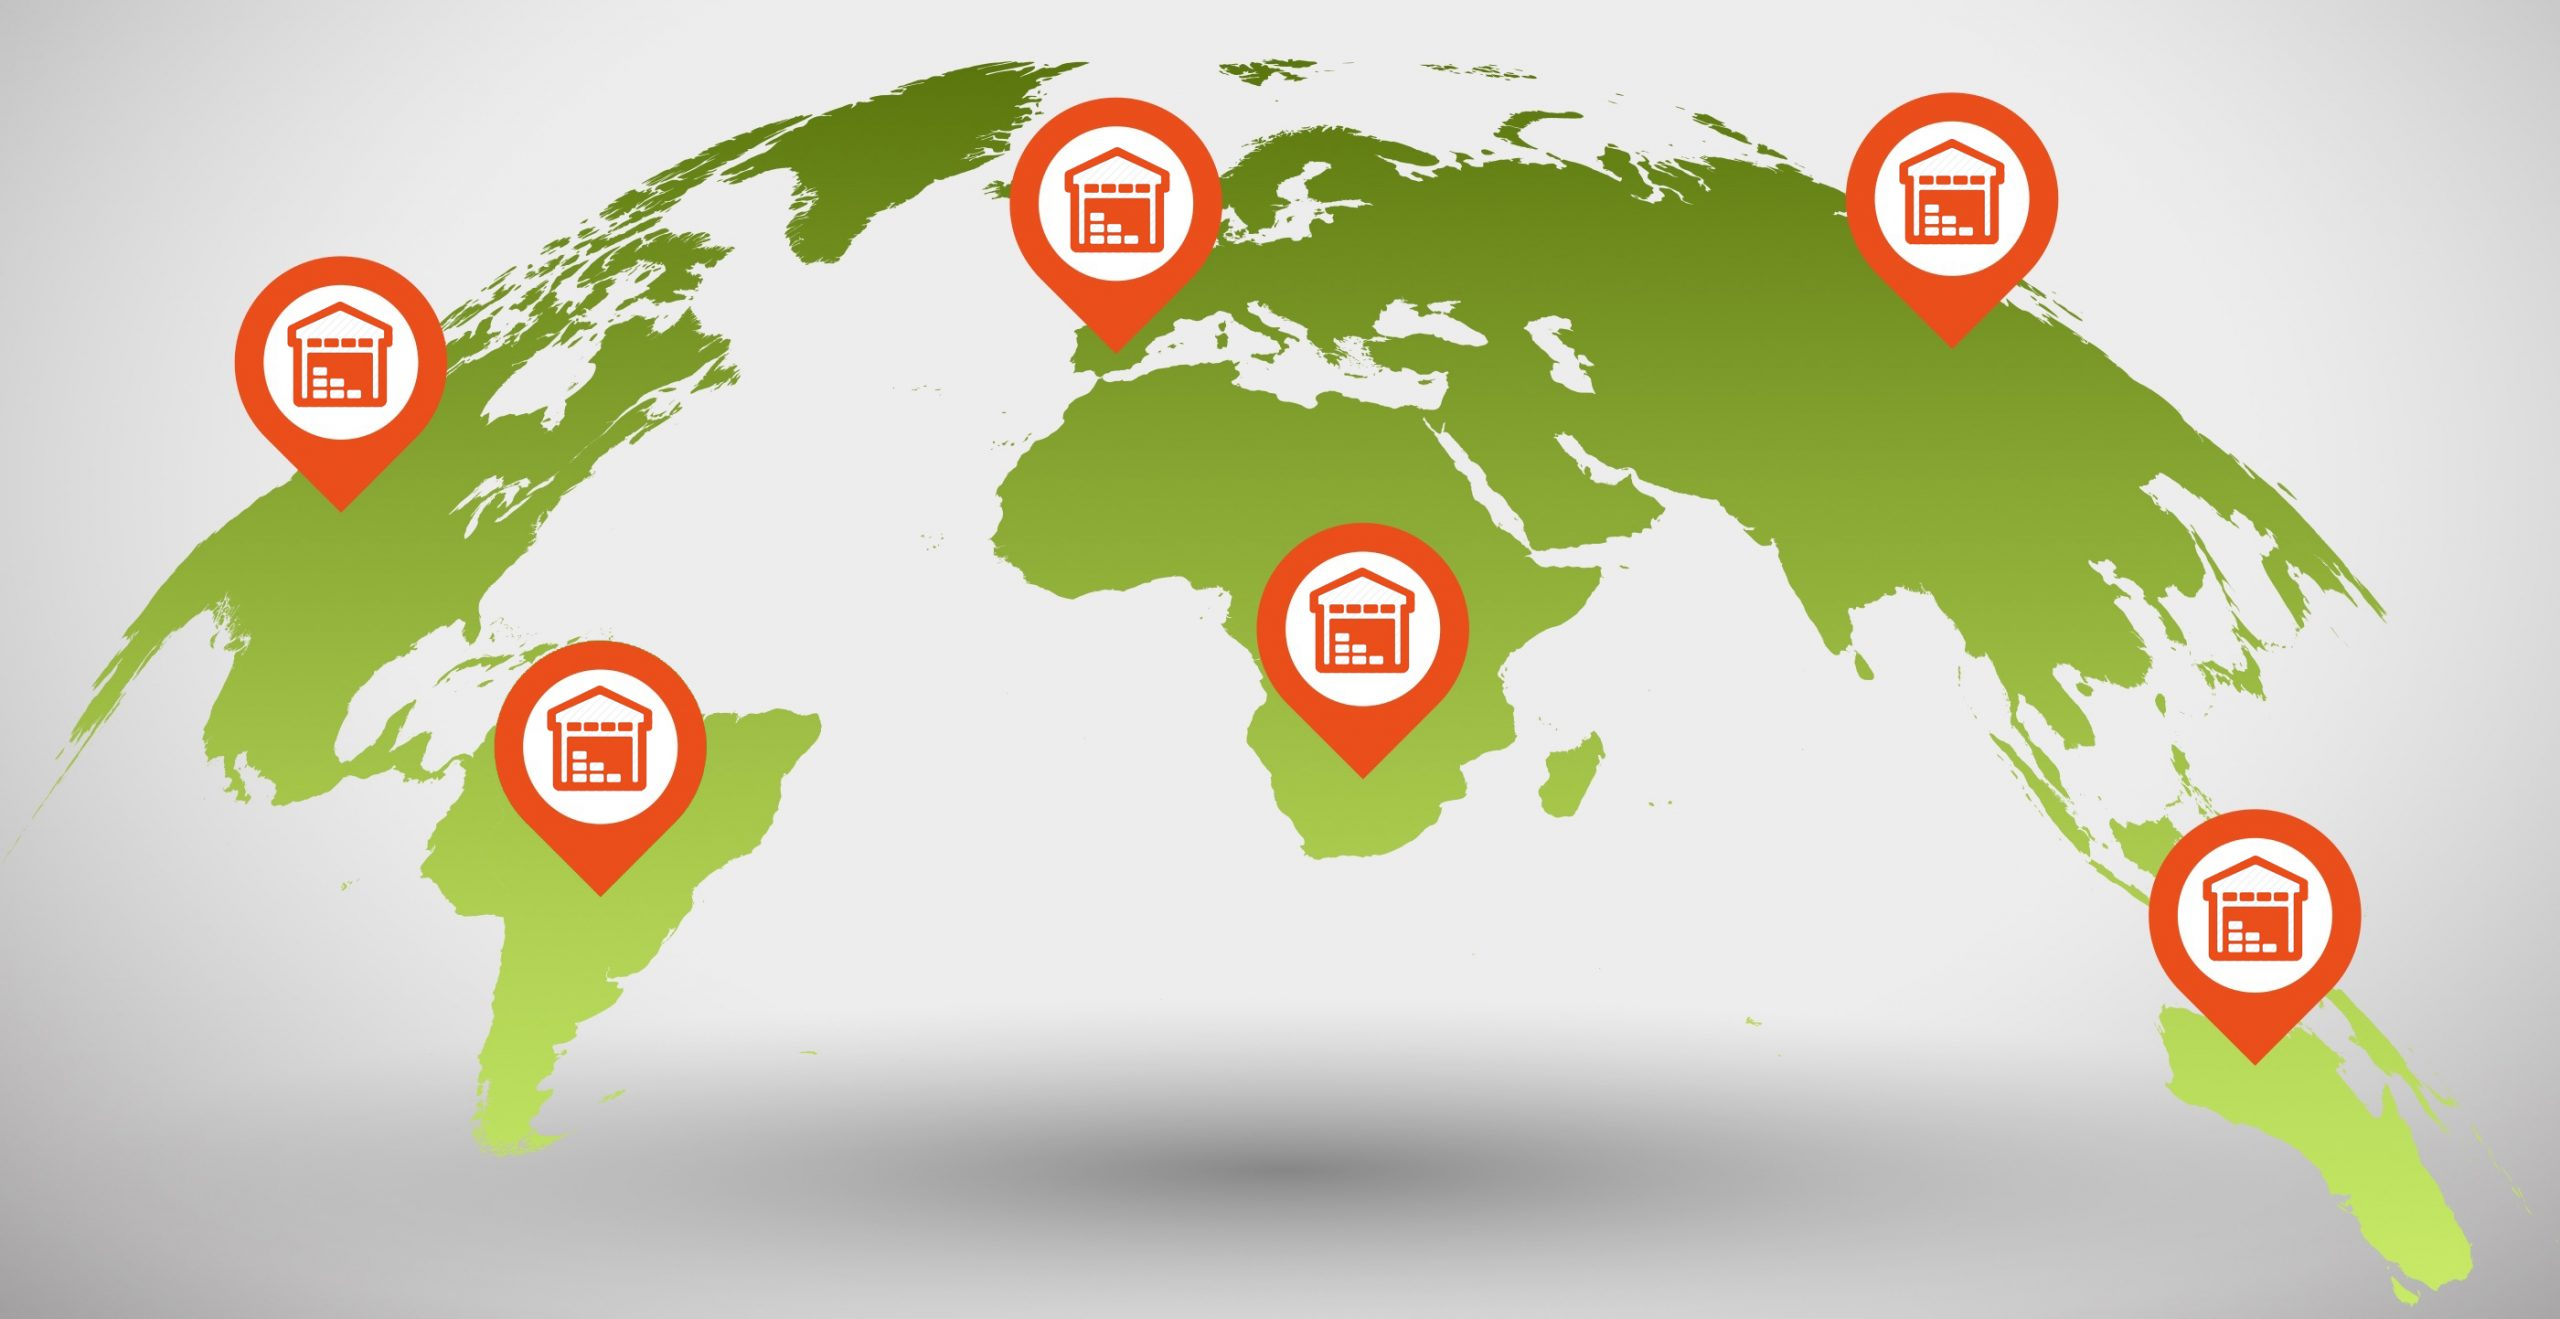 Benefits of having multiple distribution centers